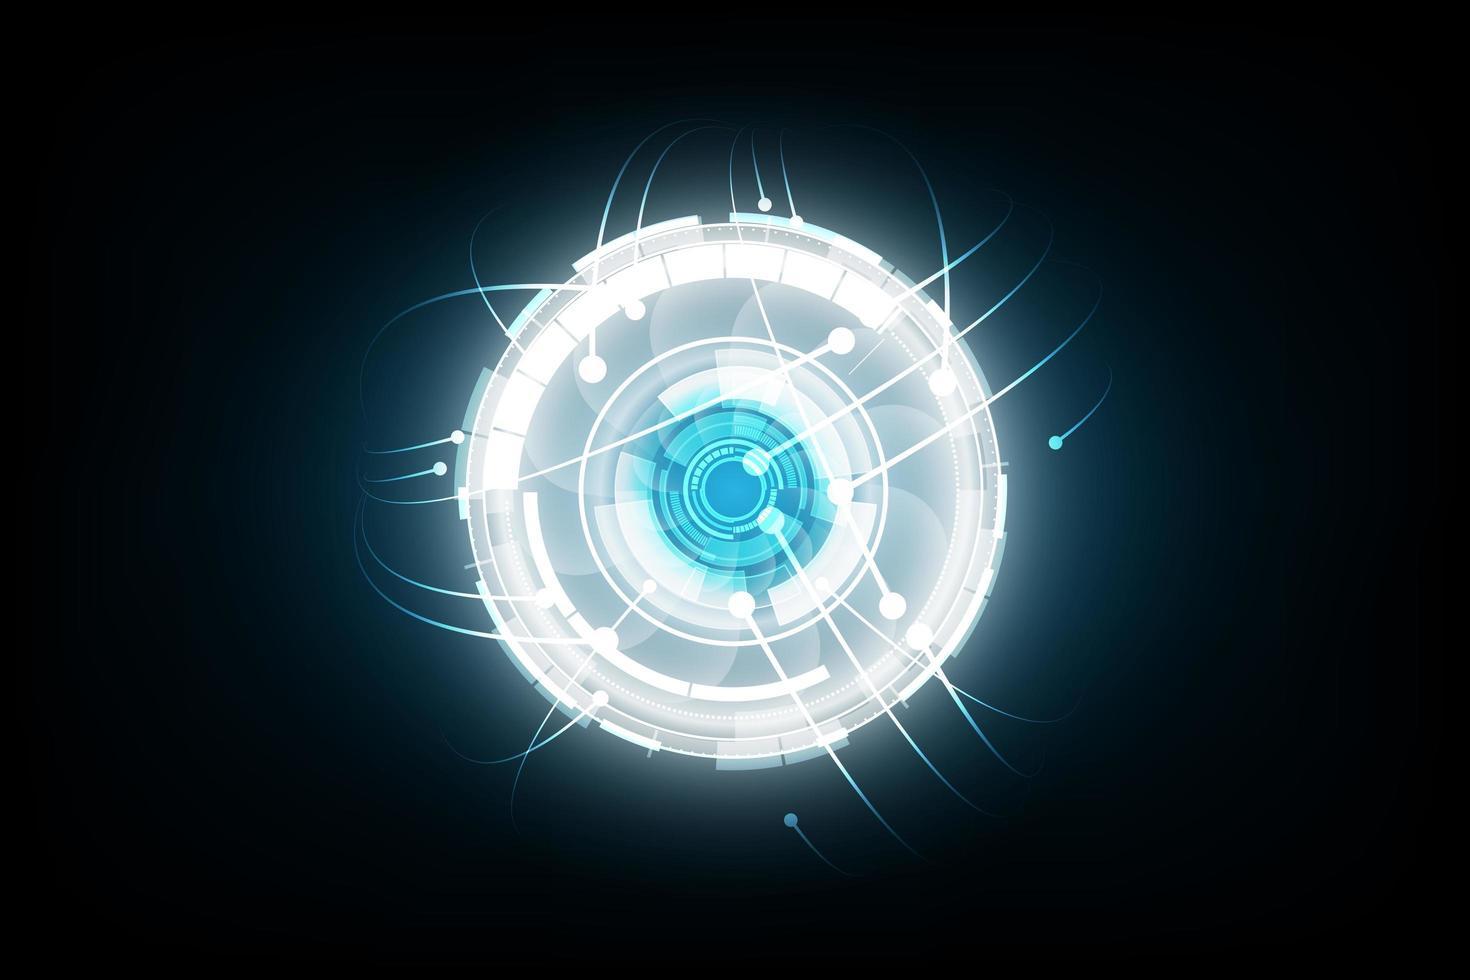 Hintergrund des abstrakten Technologiekonzepts, Vektorillustration vektor